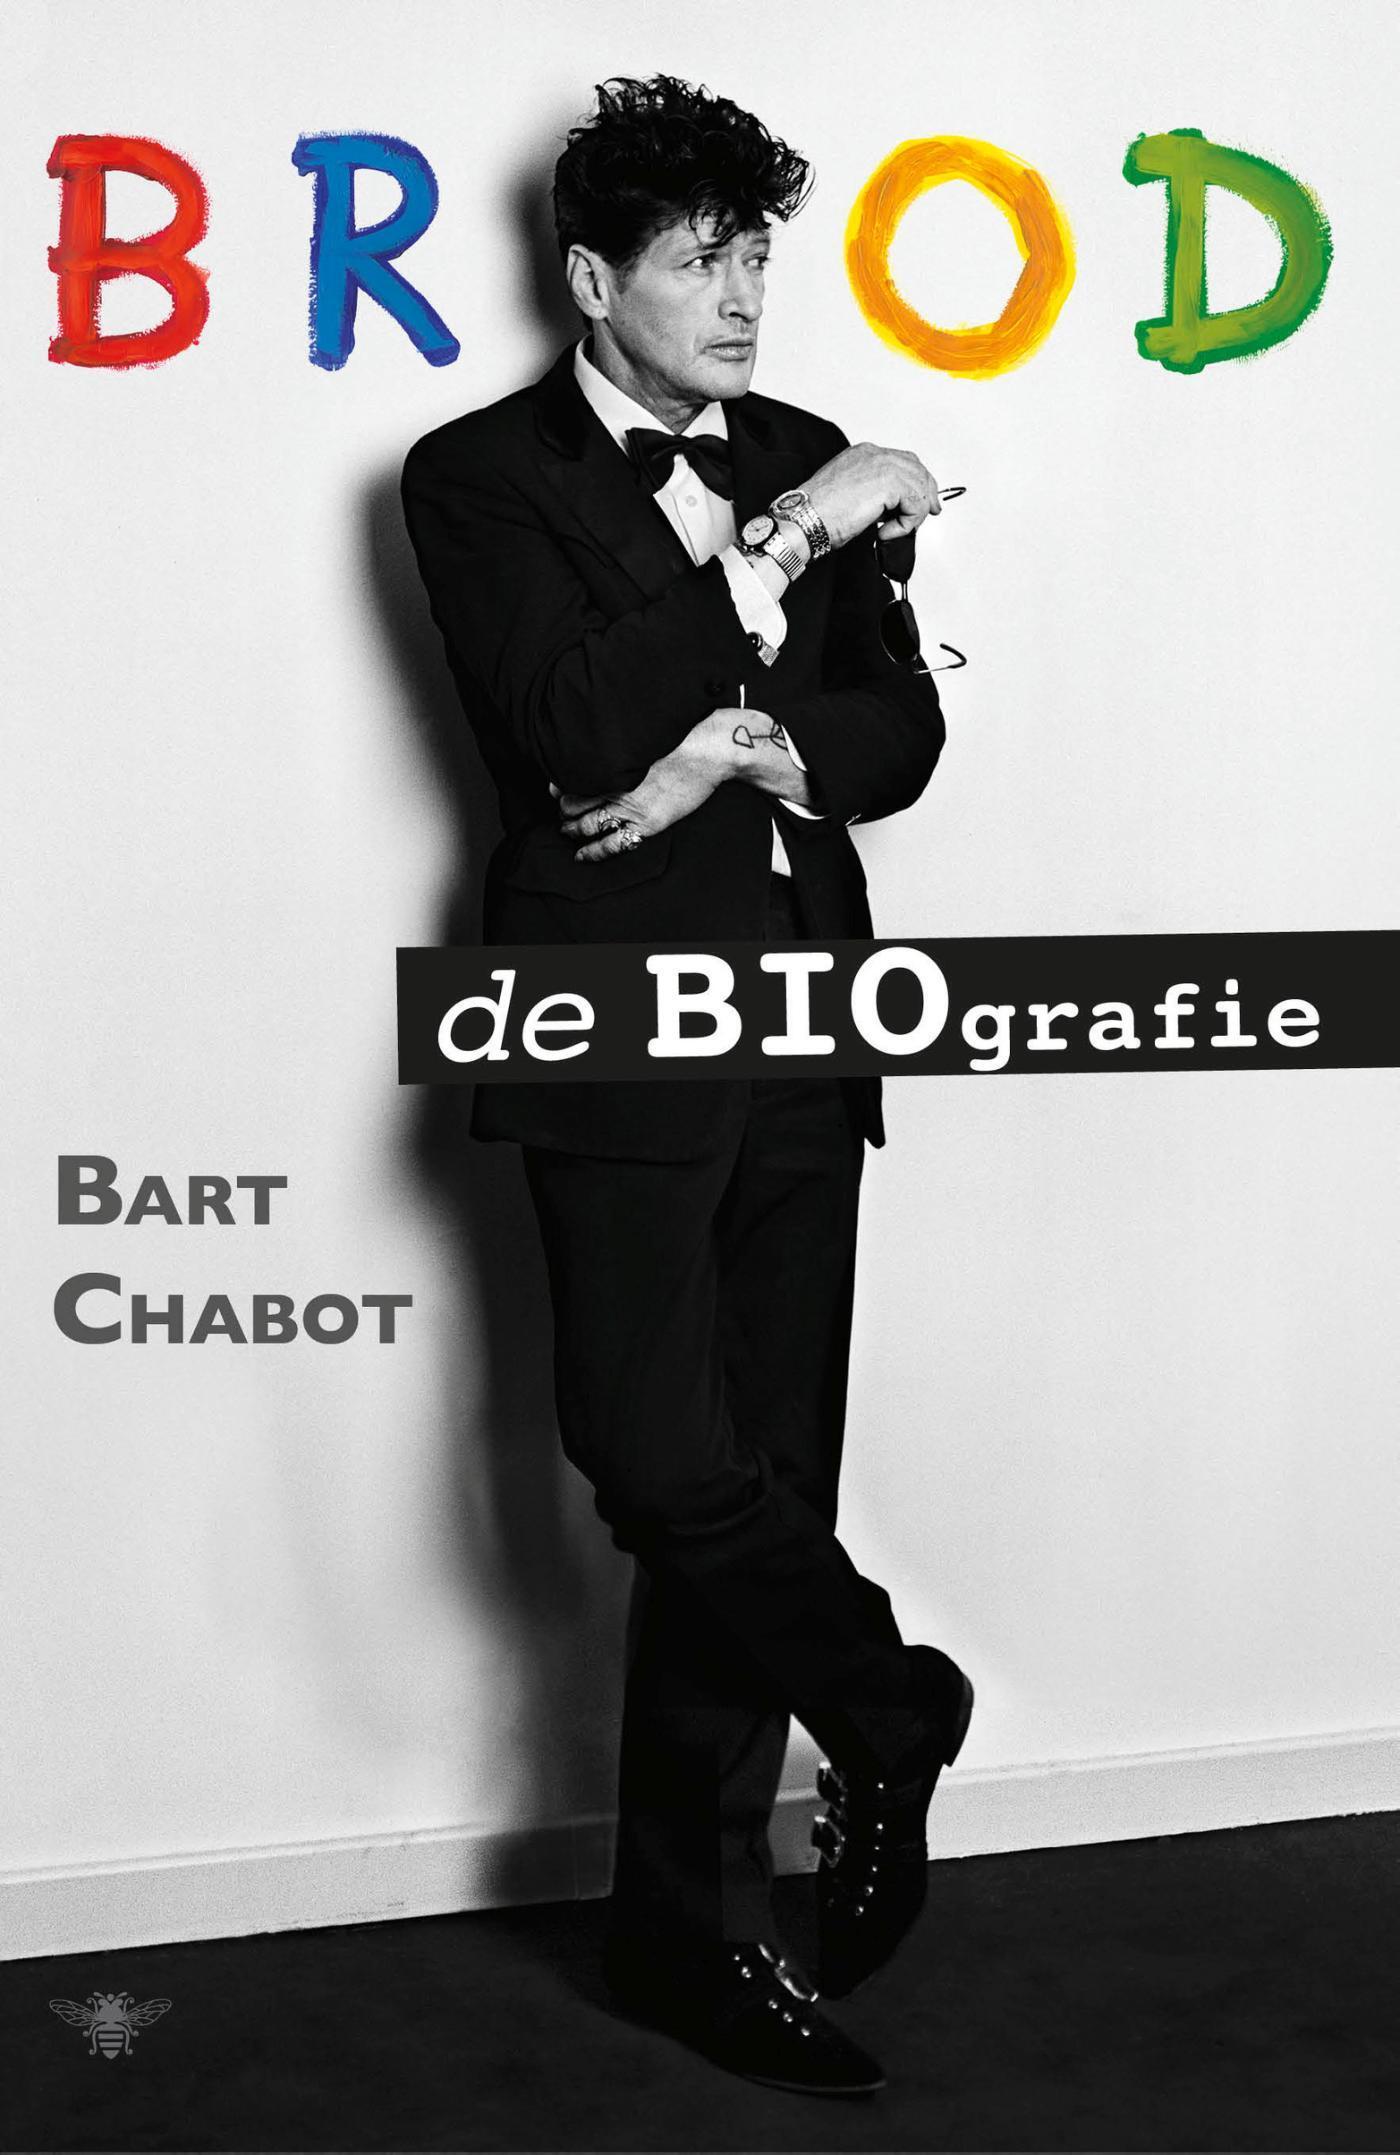 Bart Chabot - Brood de biografie